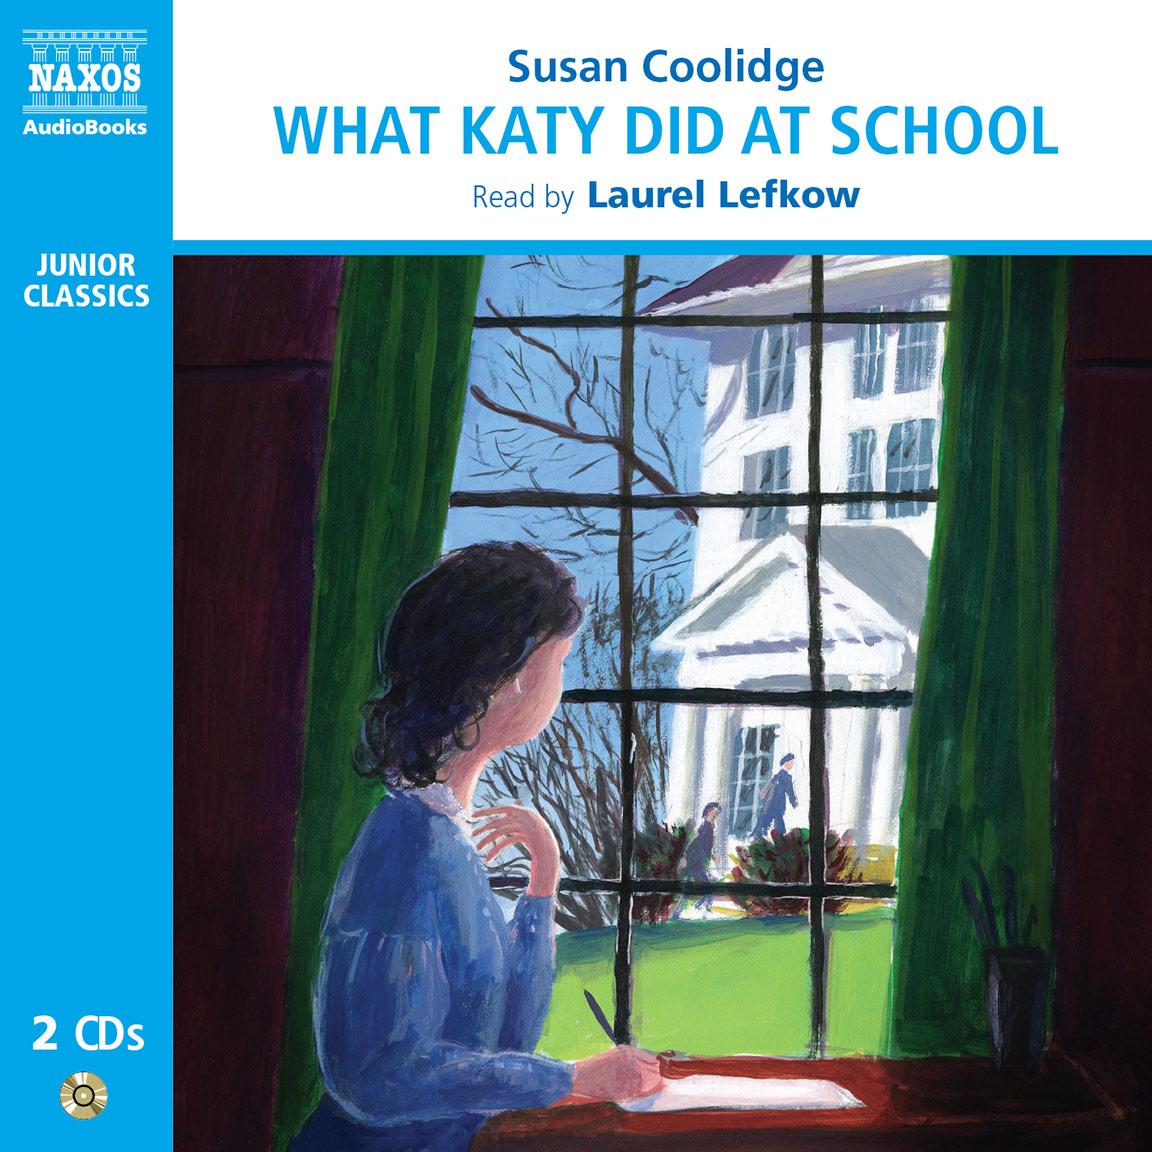 What Katy Did at School (abridged)